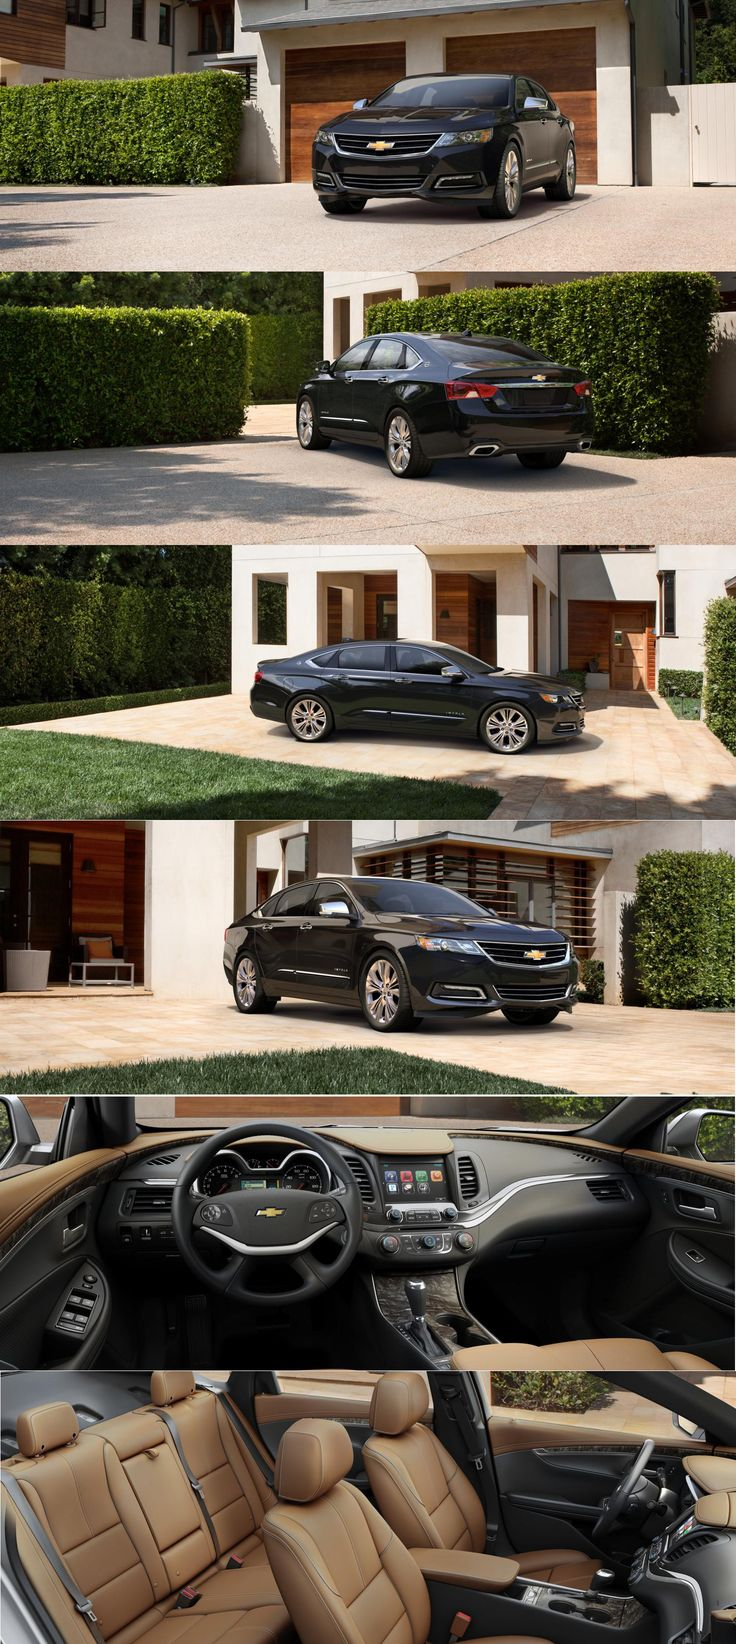 Chevrolet Impala 2015                                                                                                                                                      More